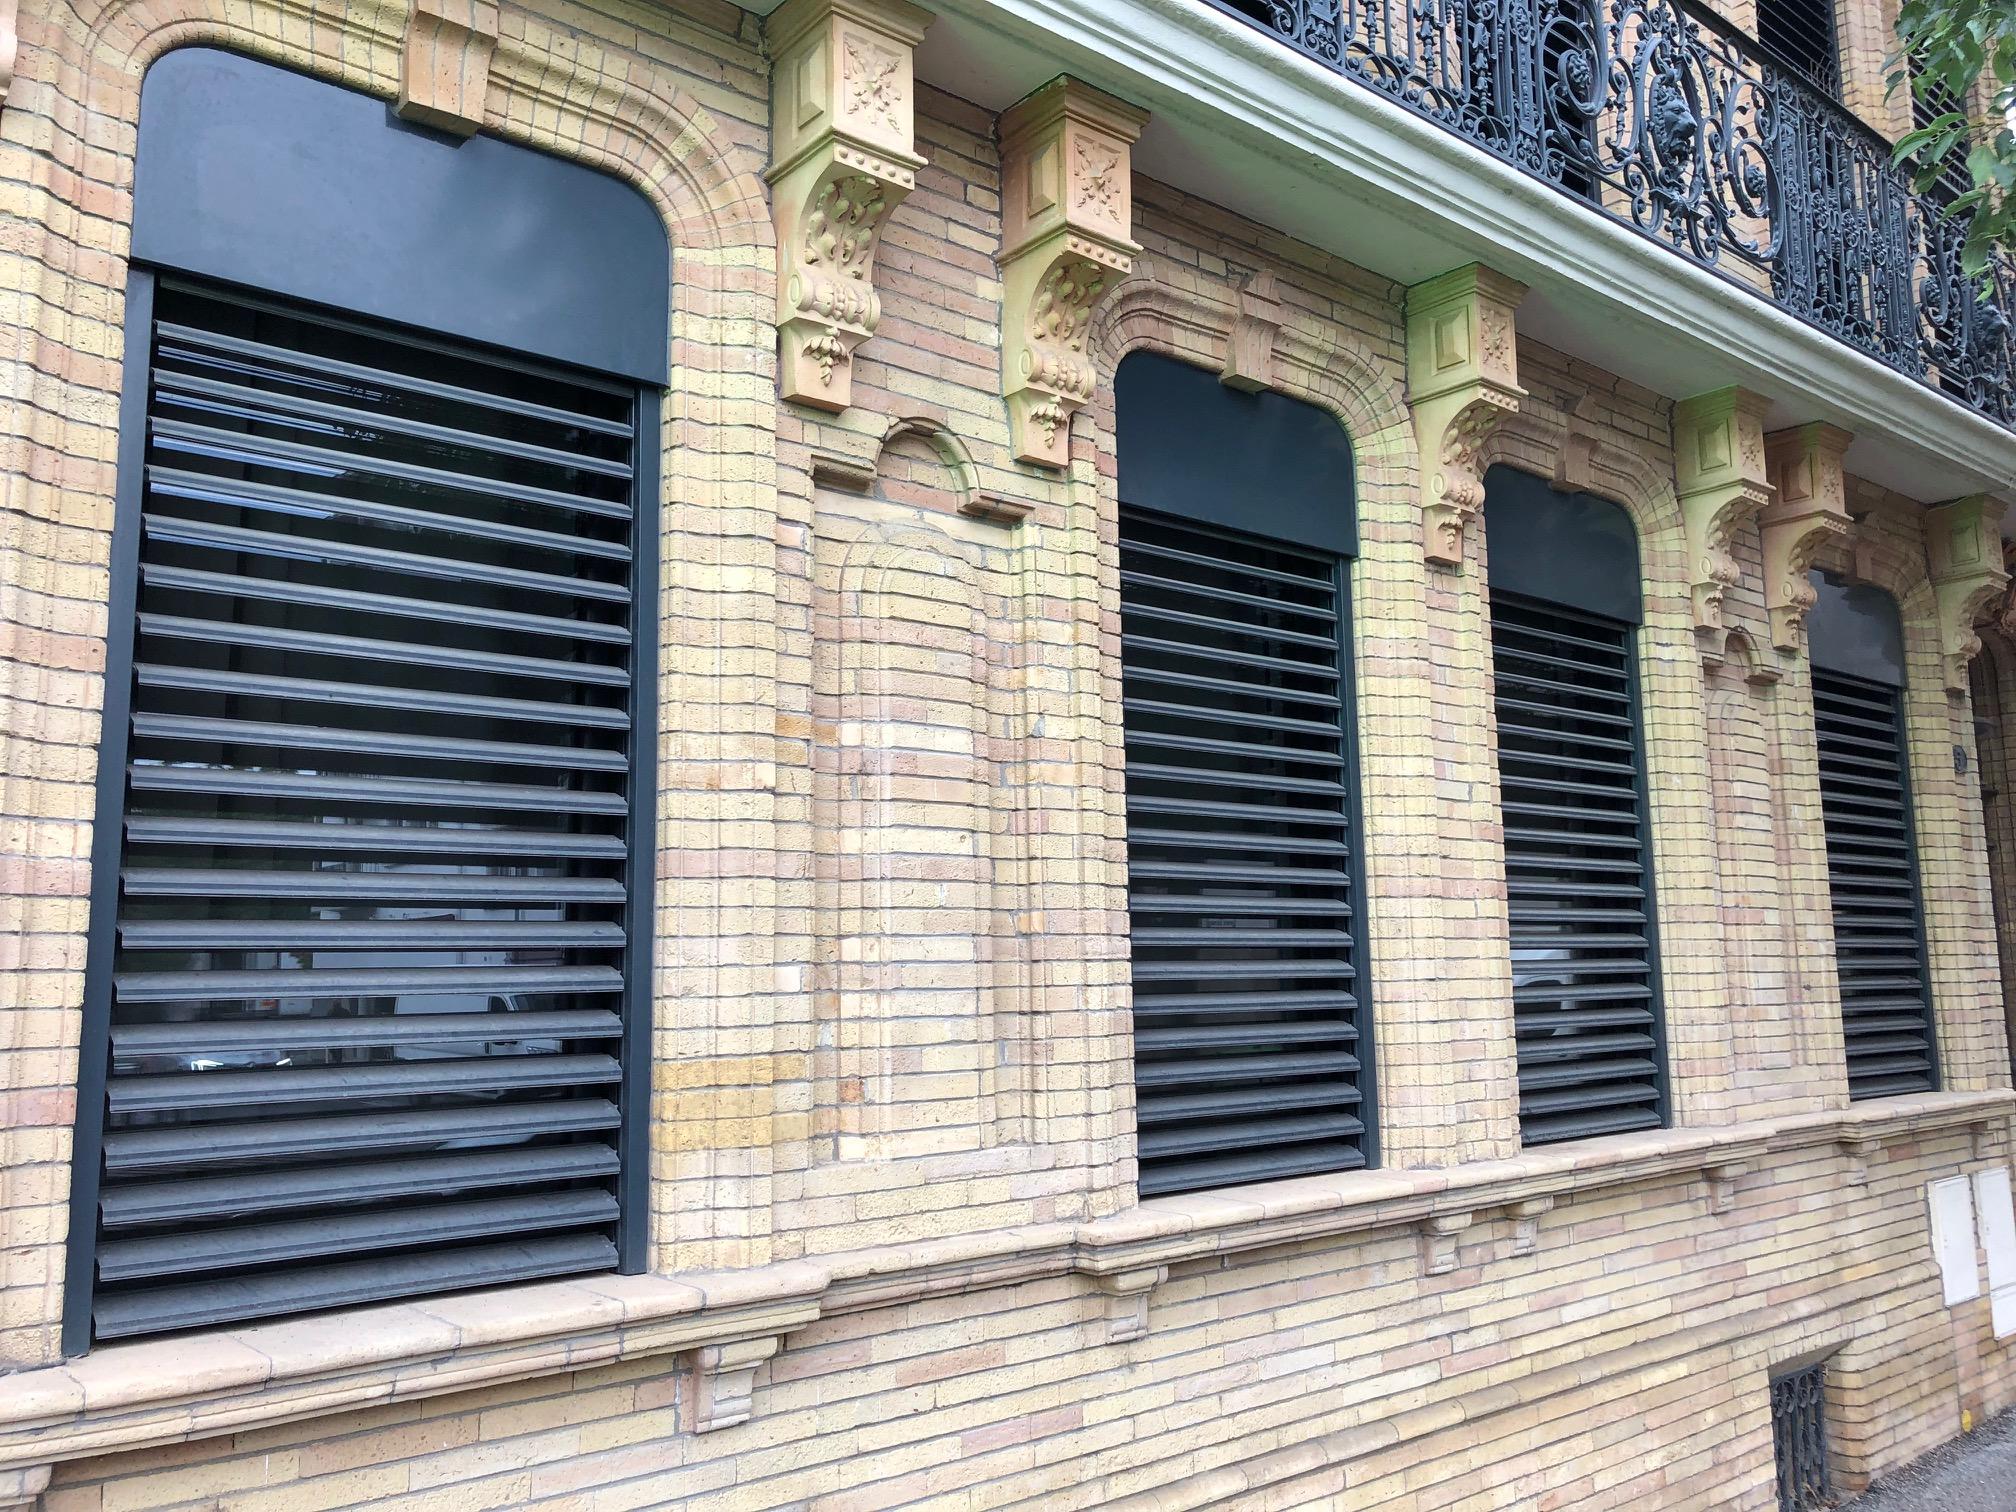 menuiserie brise soleil Toulouse